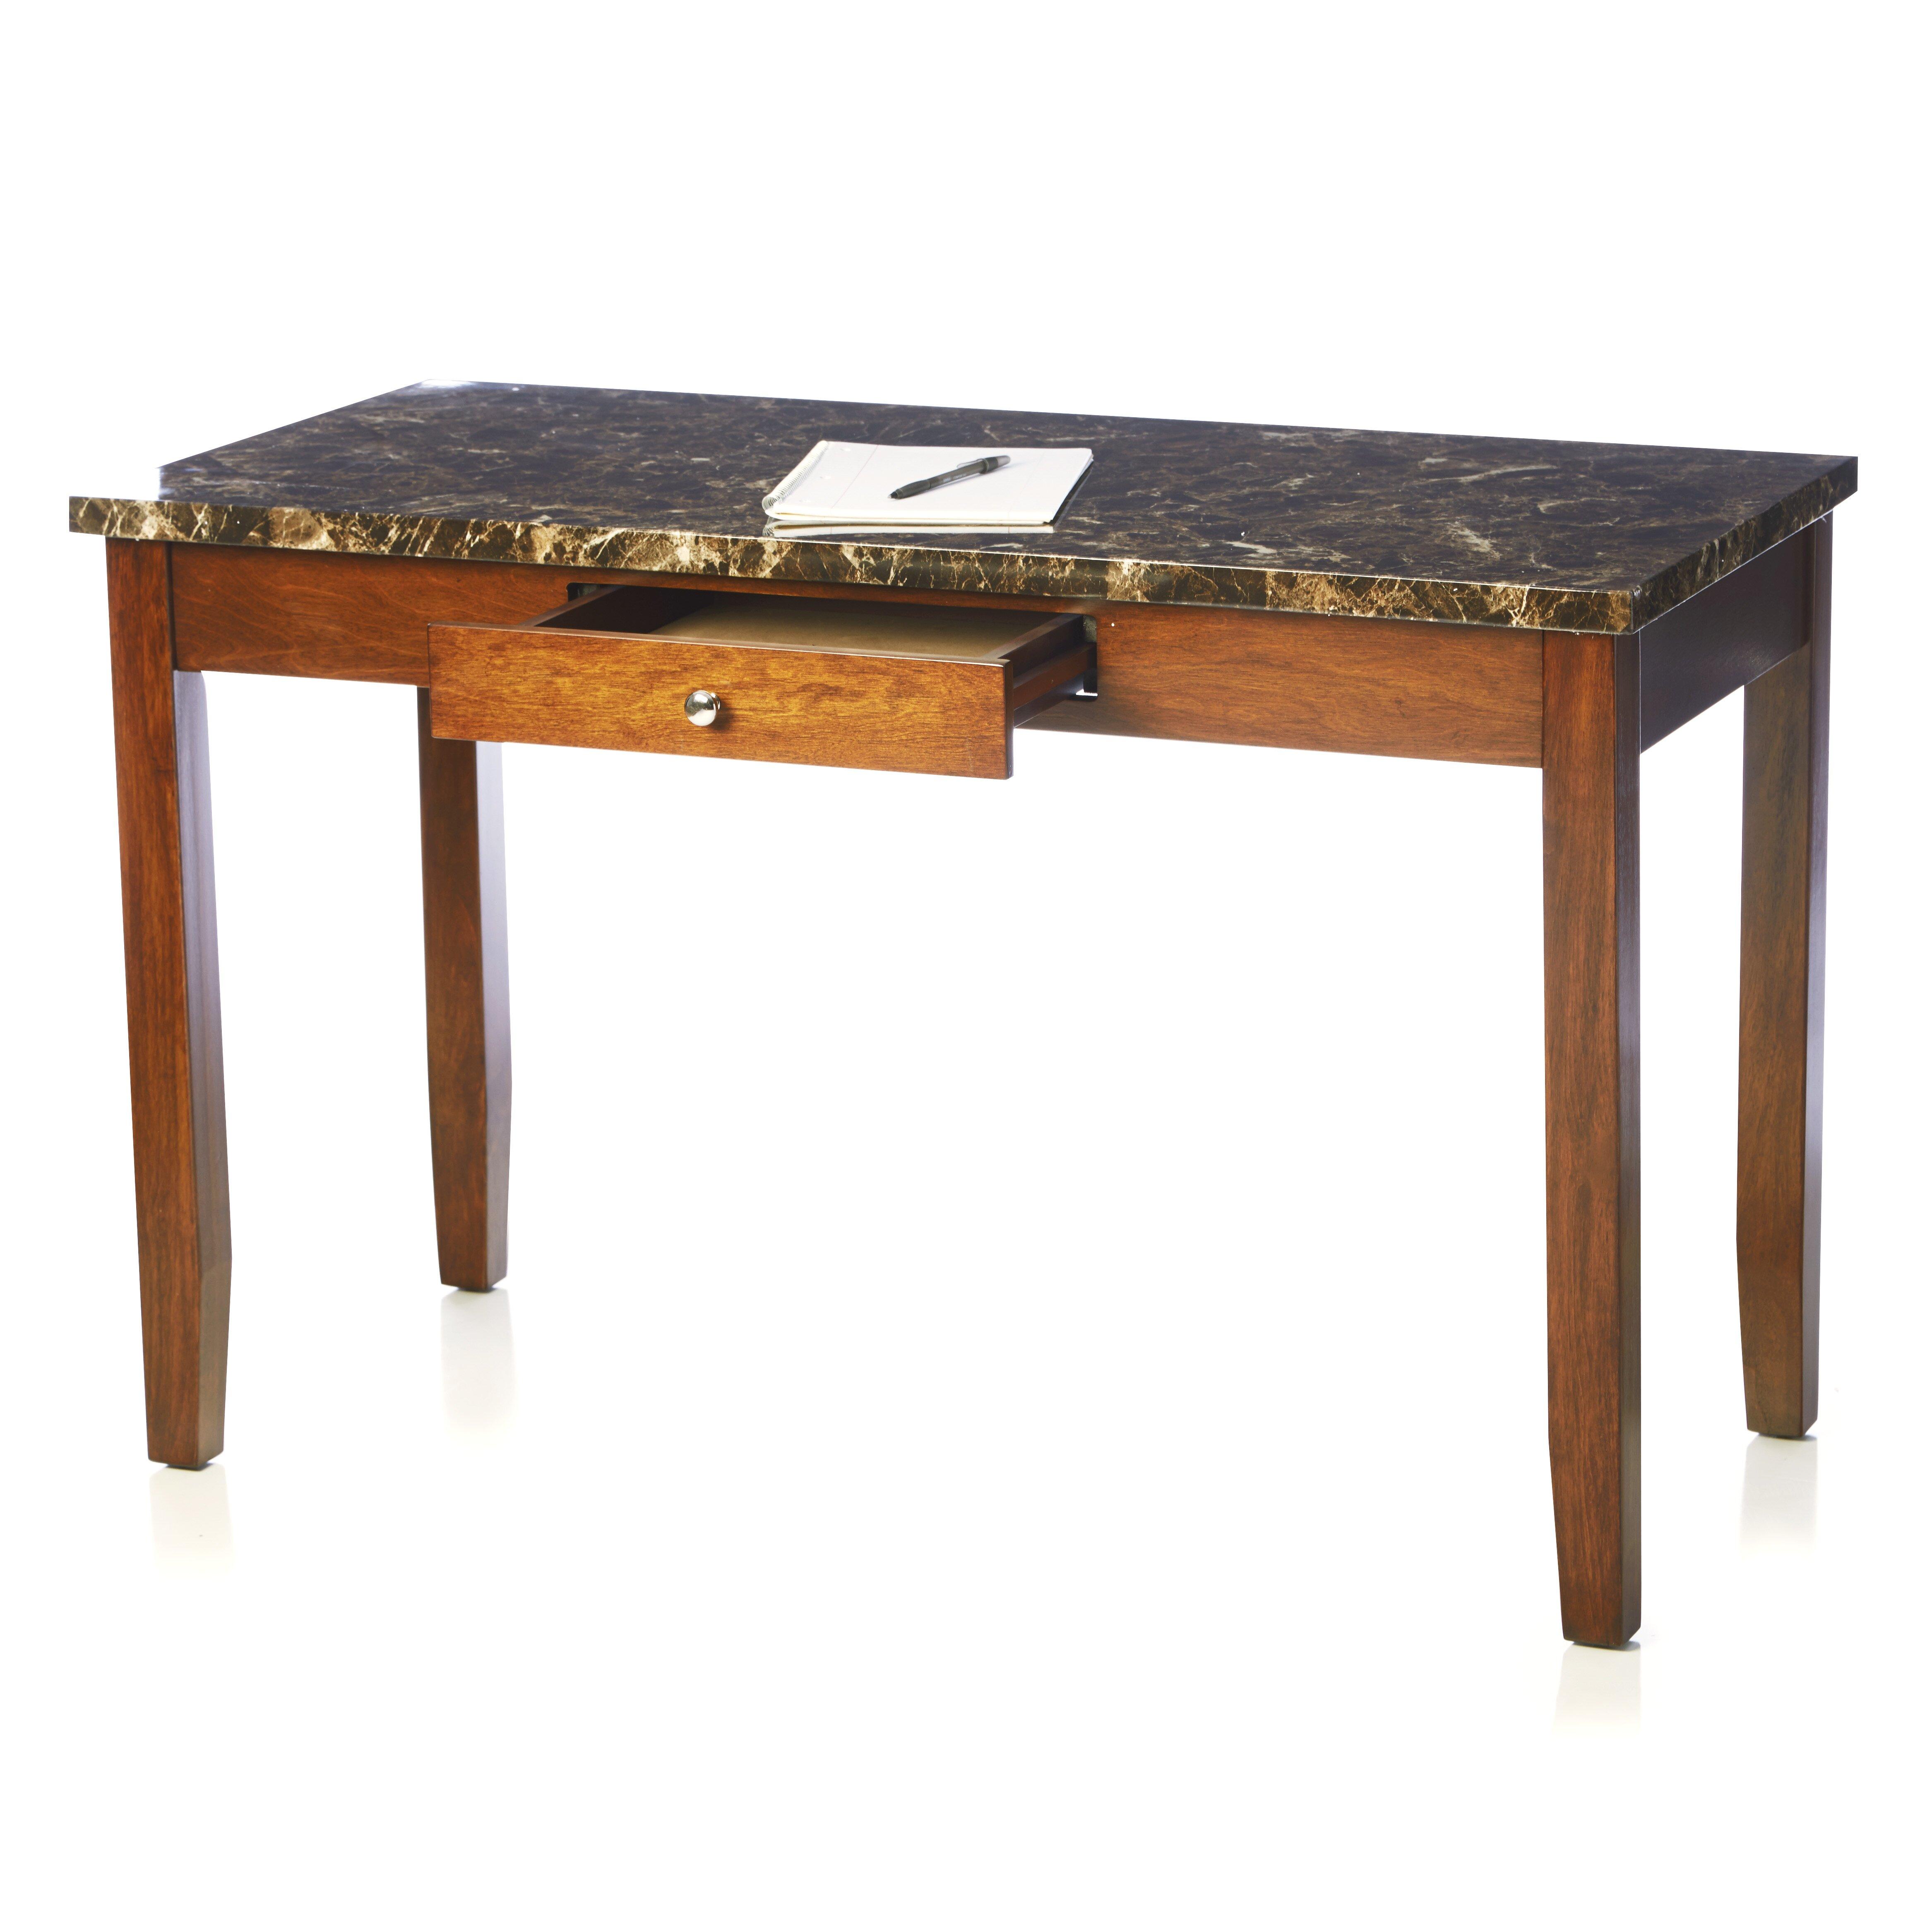 Andover Mills Oren Writing Desk And Chair & Reviews  Wayfair. Double Pedestal Dining Table. Modern Walnut Desk. Modern Gaming Desk. Sharp Microwave Drawer Specs. Non Dealing Desk Forex Brokers. Butchers Table. Electric Adjustable Desk Legs. Custom Wood Table